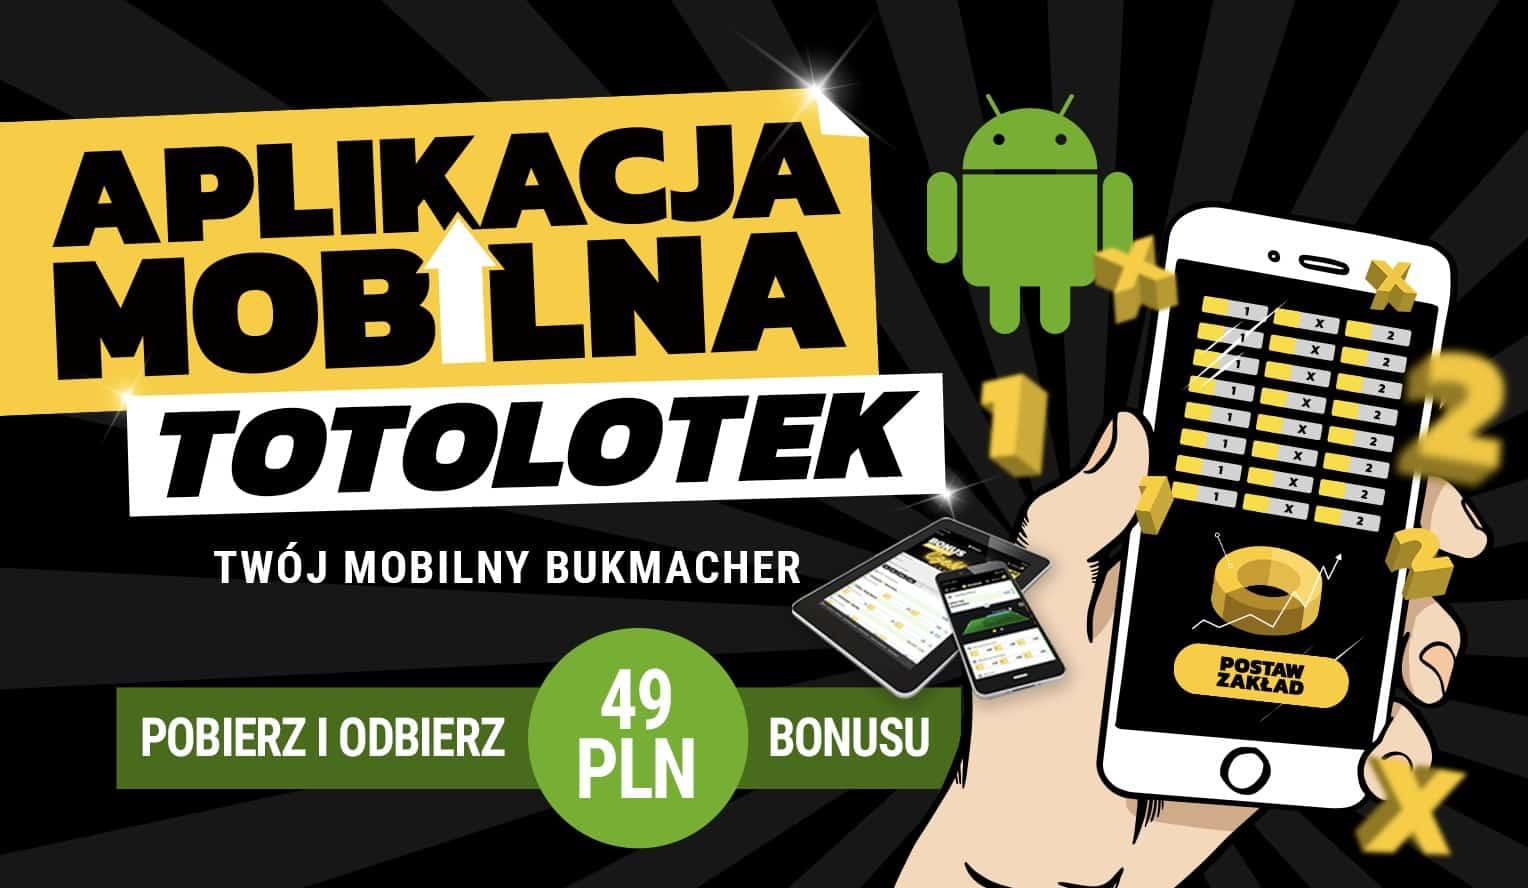 Photo of Totolotek aplikacja mobilna na telefon – Android apk, iOS. Oferta, opinie, bonusy